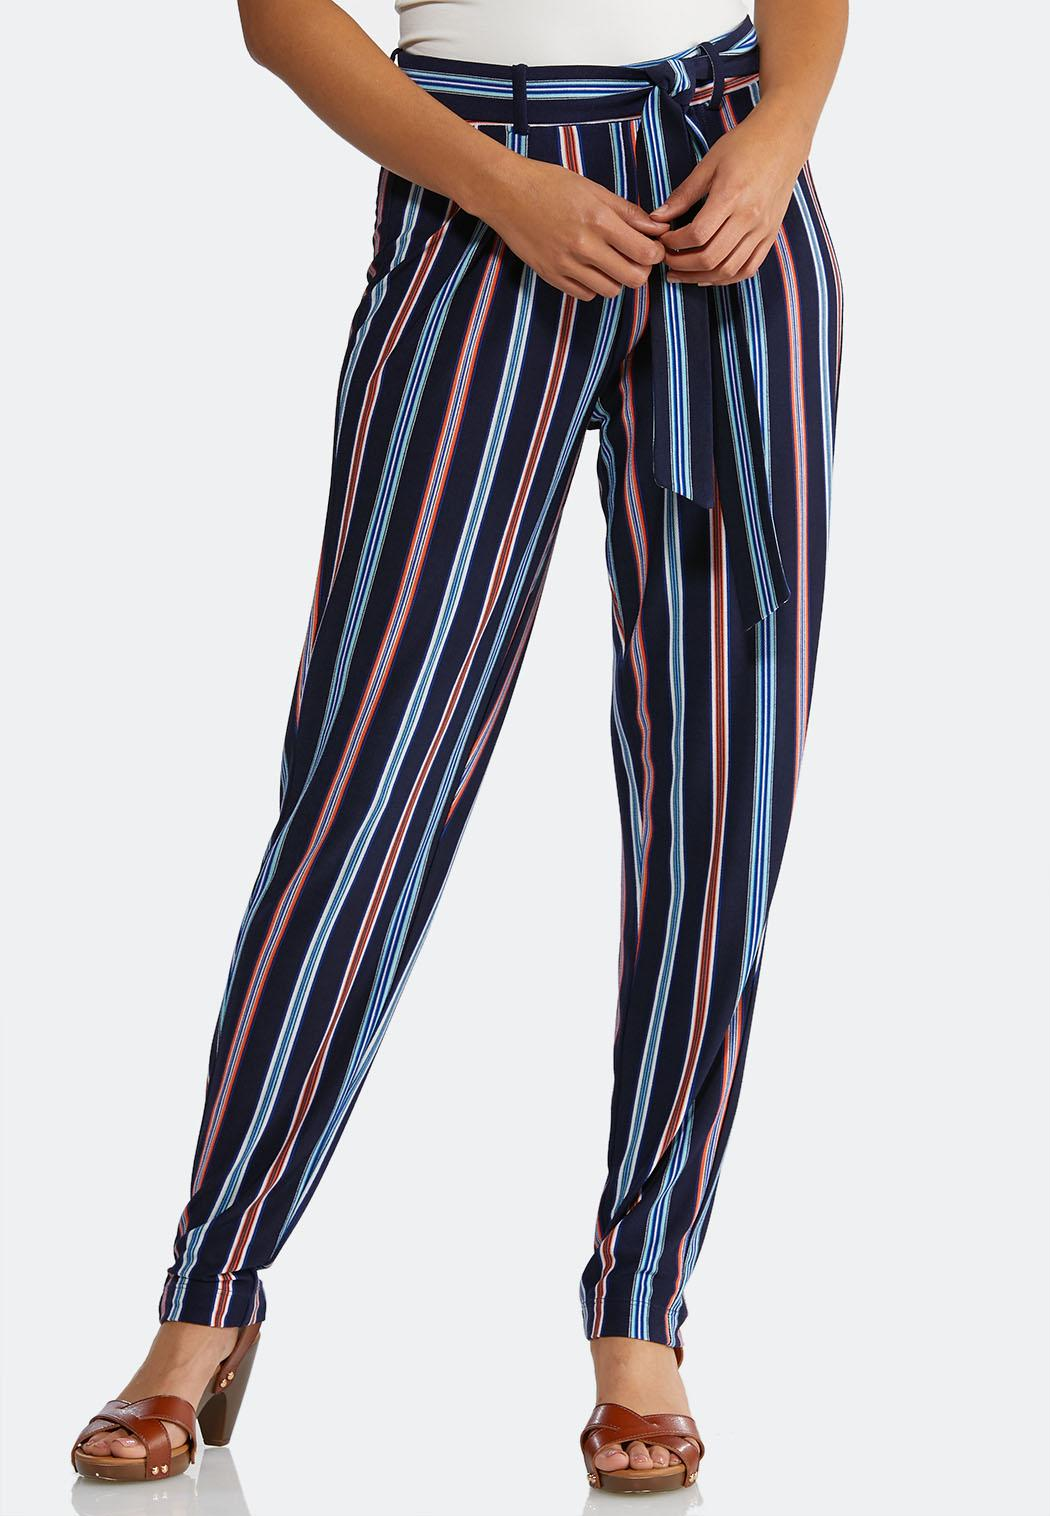 c16f6f201e Stripe Tie Waist Pants alternate view Stripe Tie Waist Pants